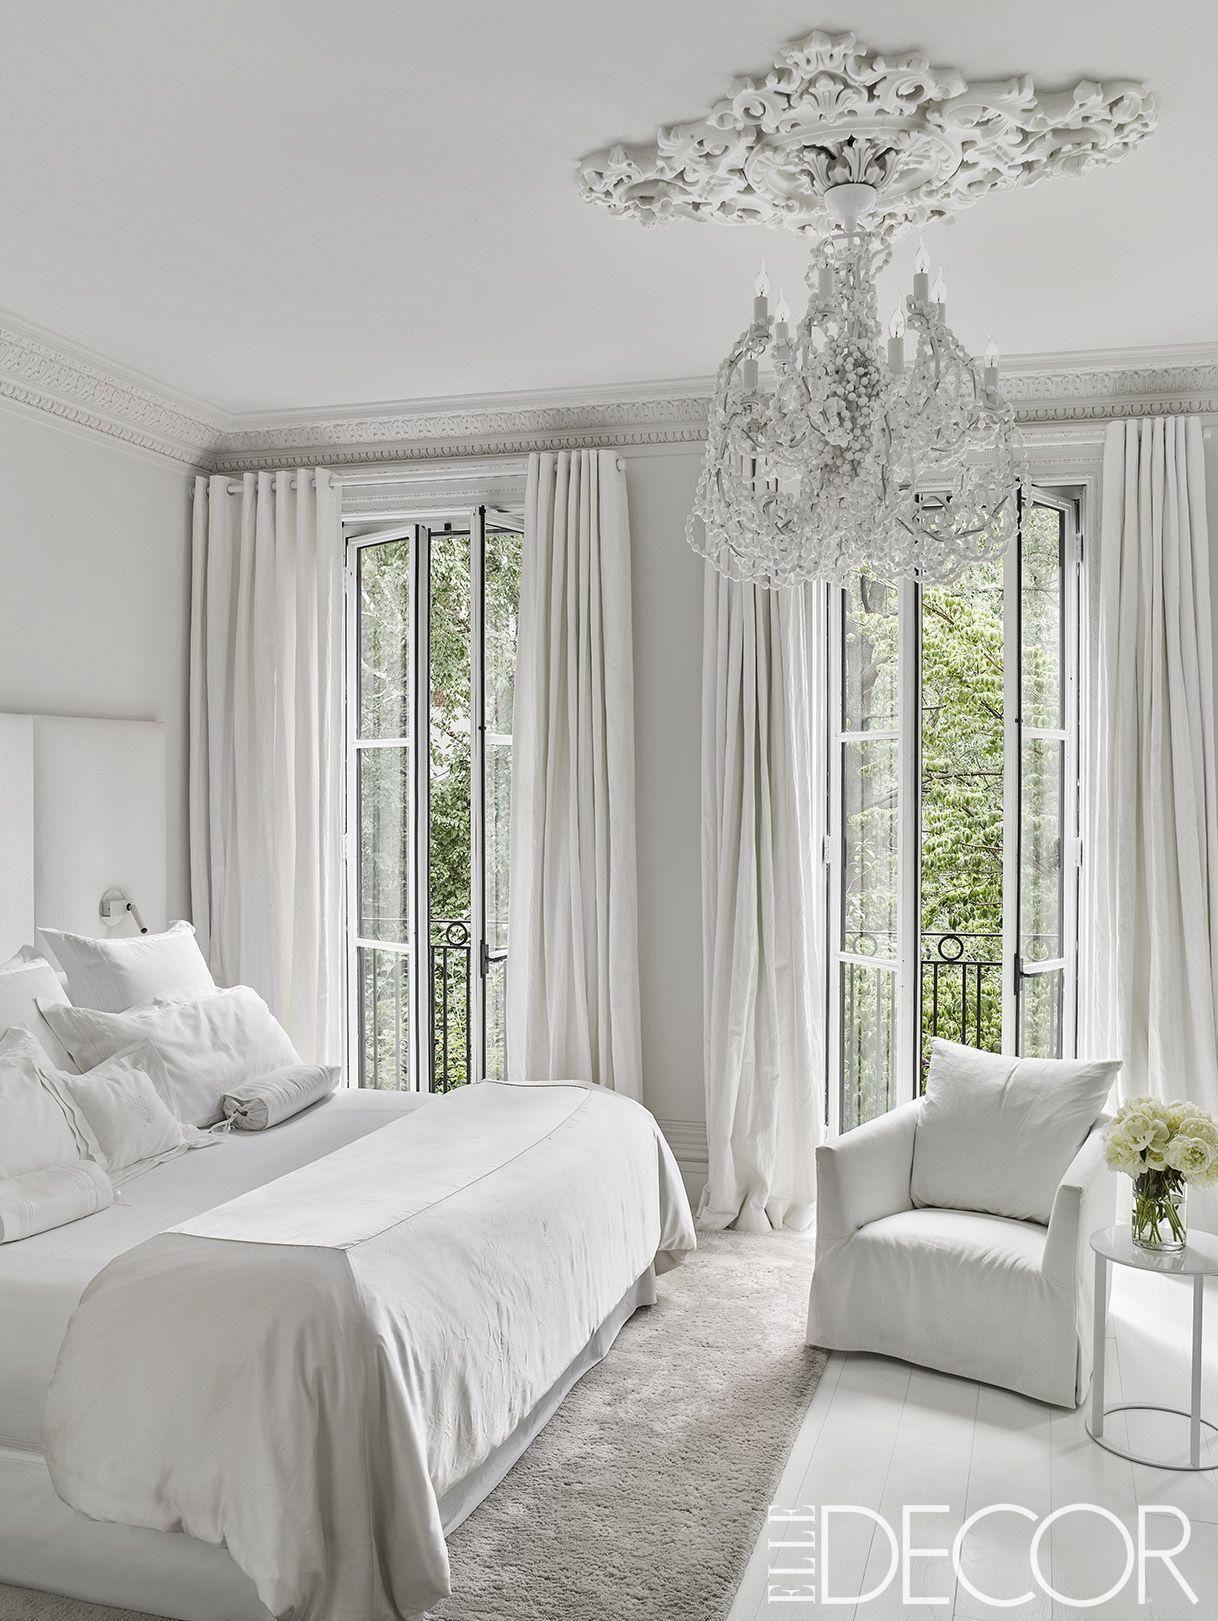 25 Minimalist Bedroom Decor Ideas - Modern Designs for ... on Bedroom Minimalist Design Ideas  id=33937